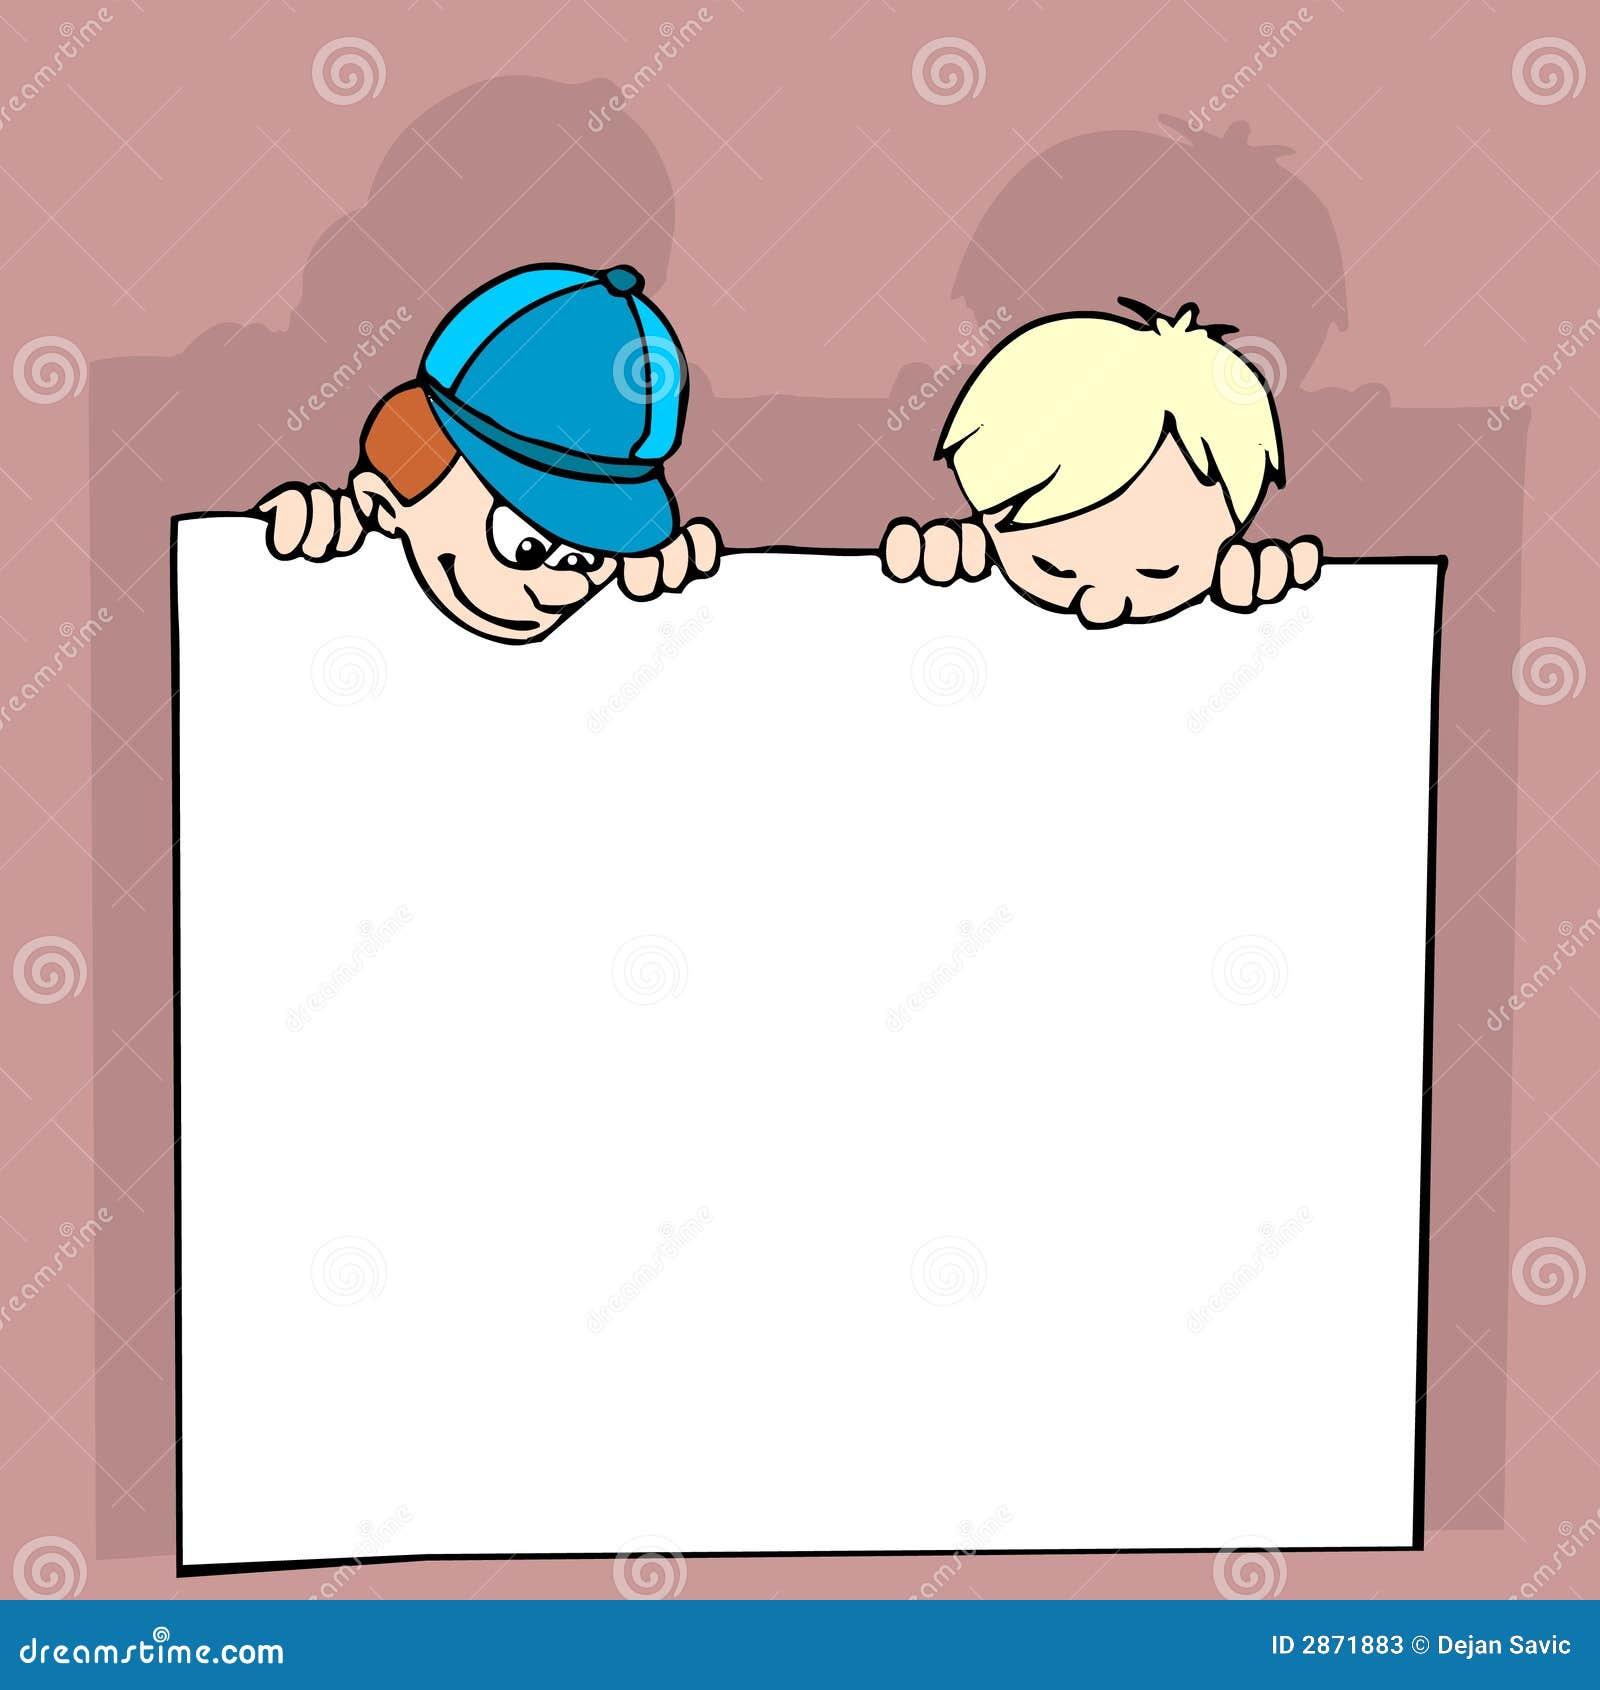 ppt 背景 背景图片 边框 模板 设计 矢量 矢量图 素材 相框 1300_1390图片